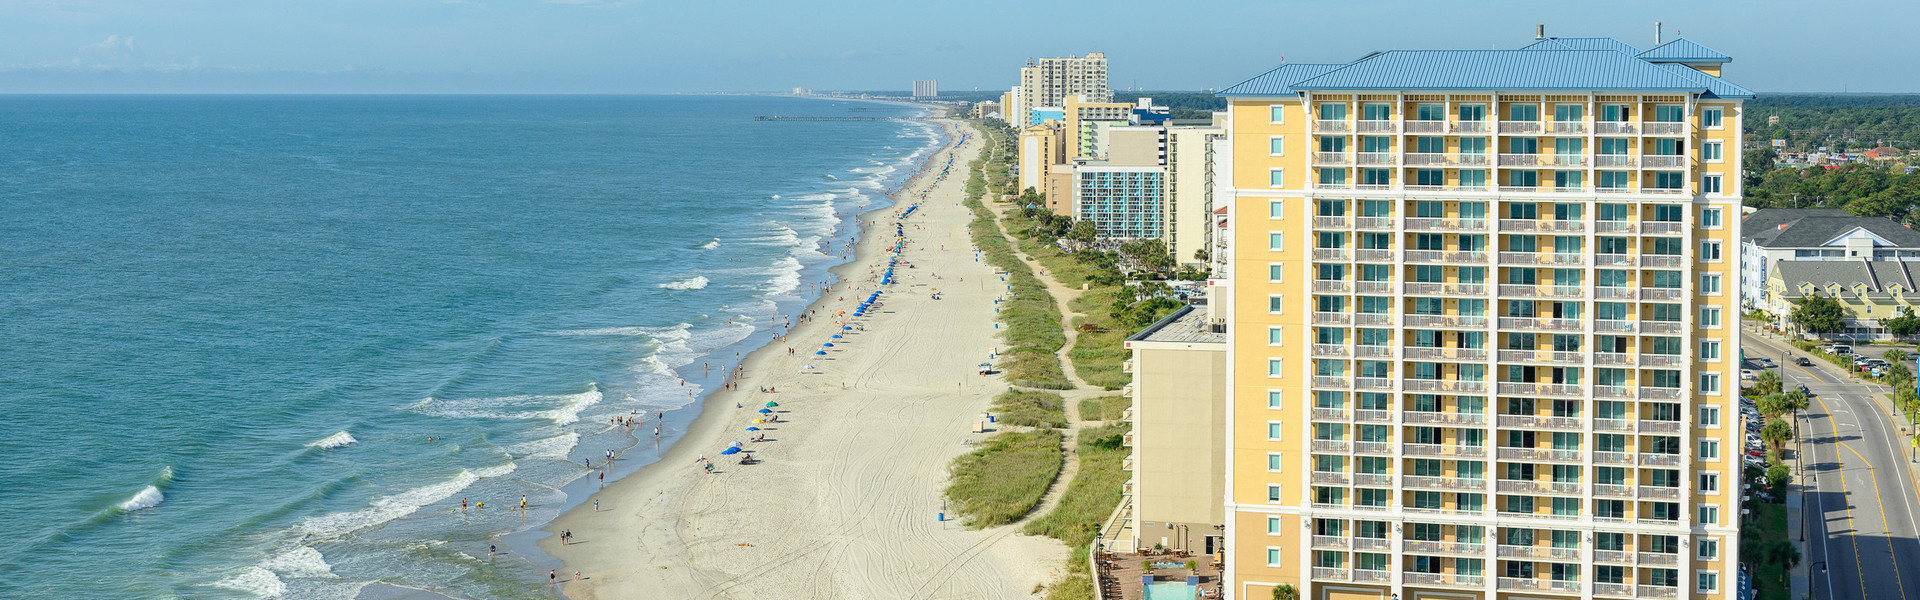 Family Friendly Resorts in Myrtle Beach | Myrtle Beach ...